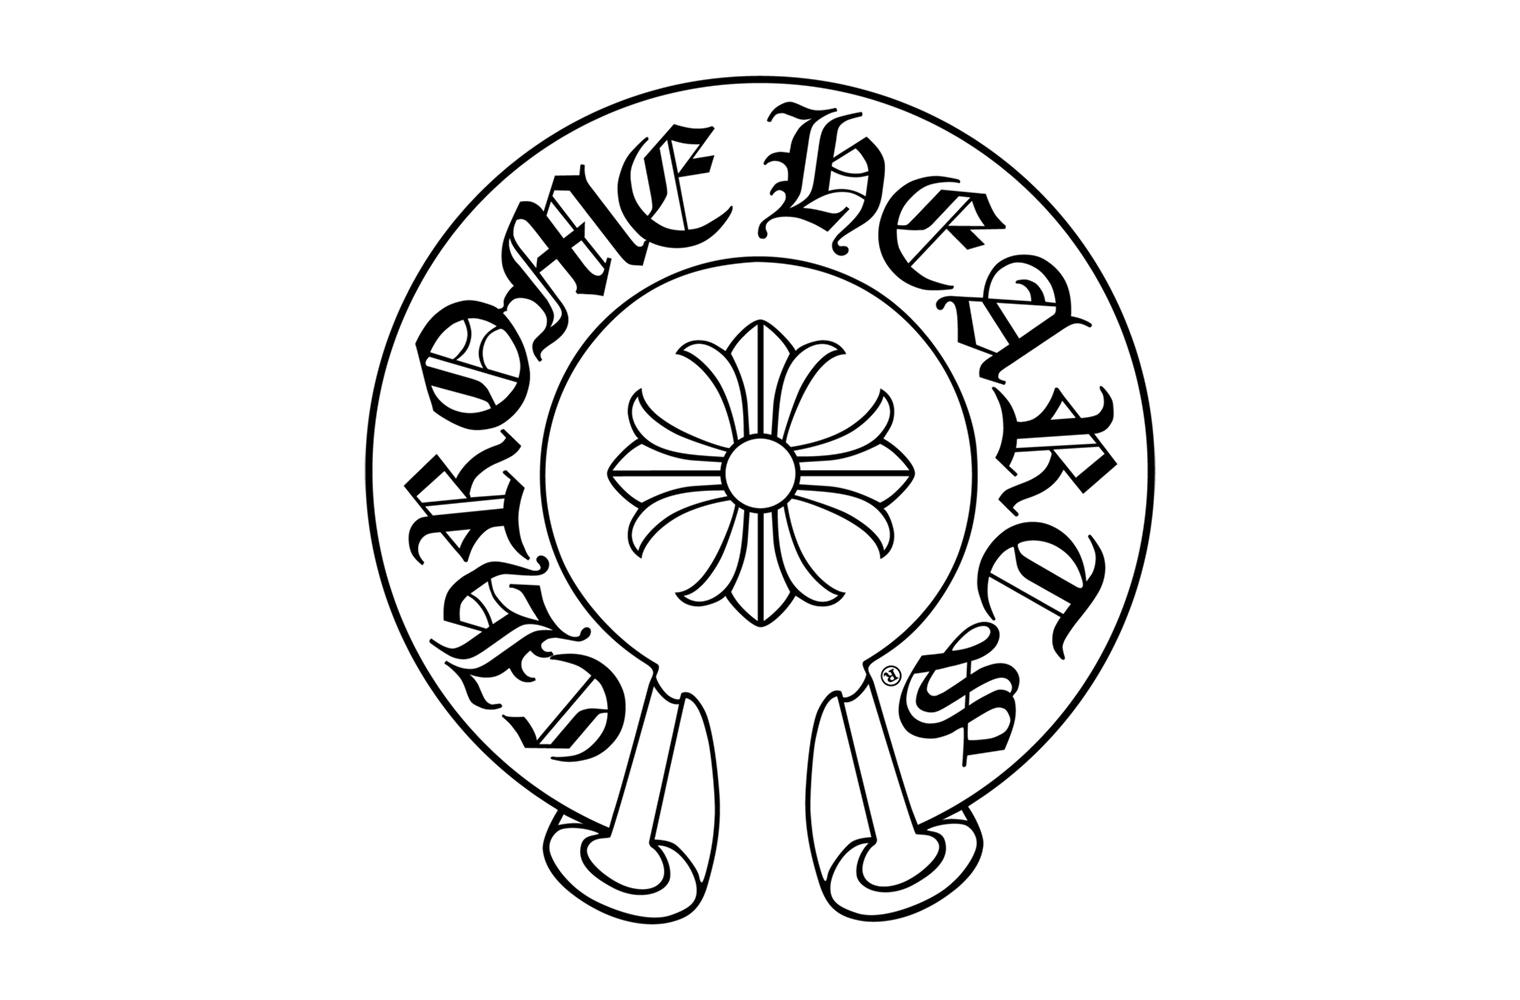 Логотип бренда Chrome Hearts